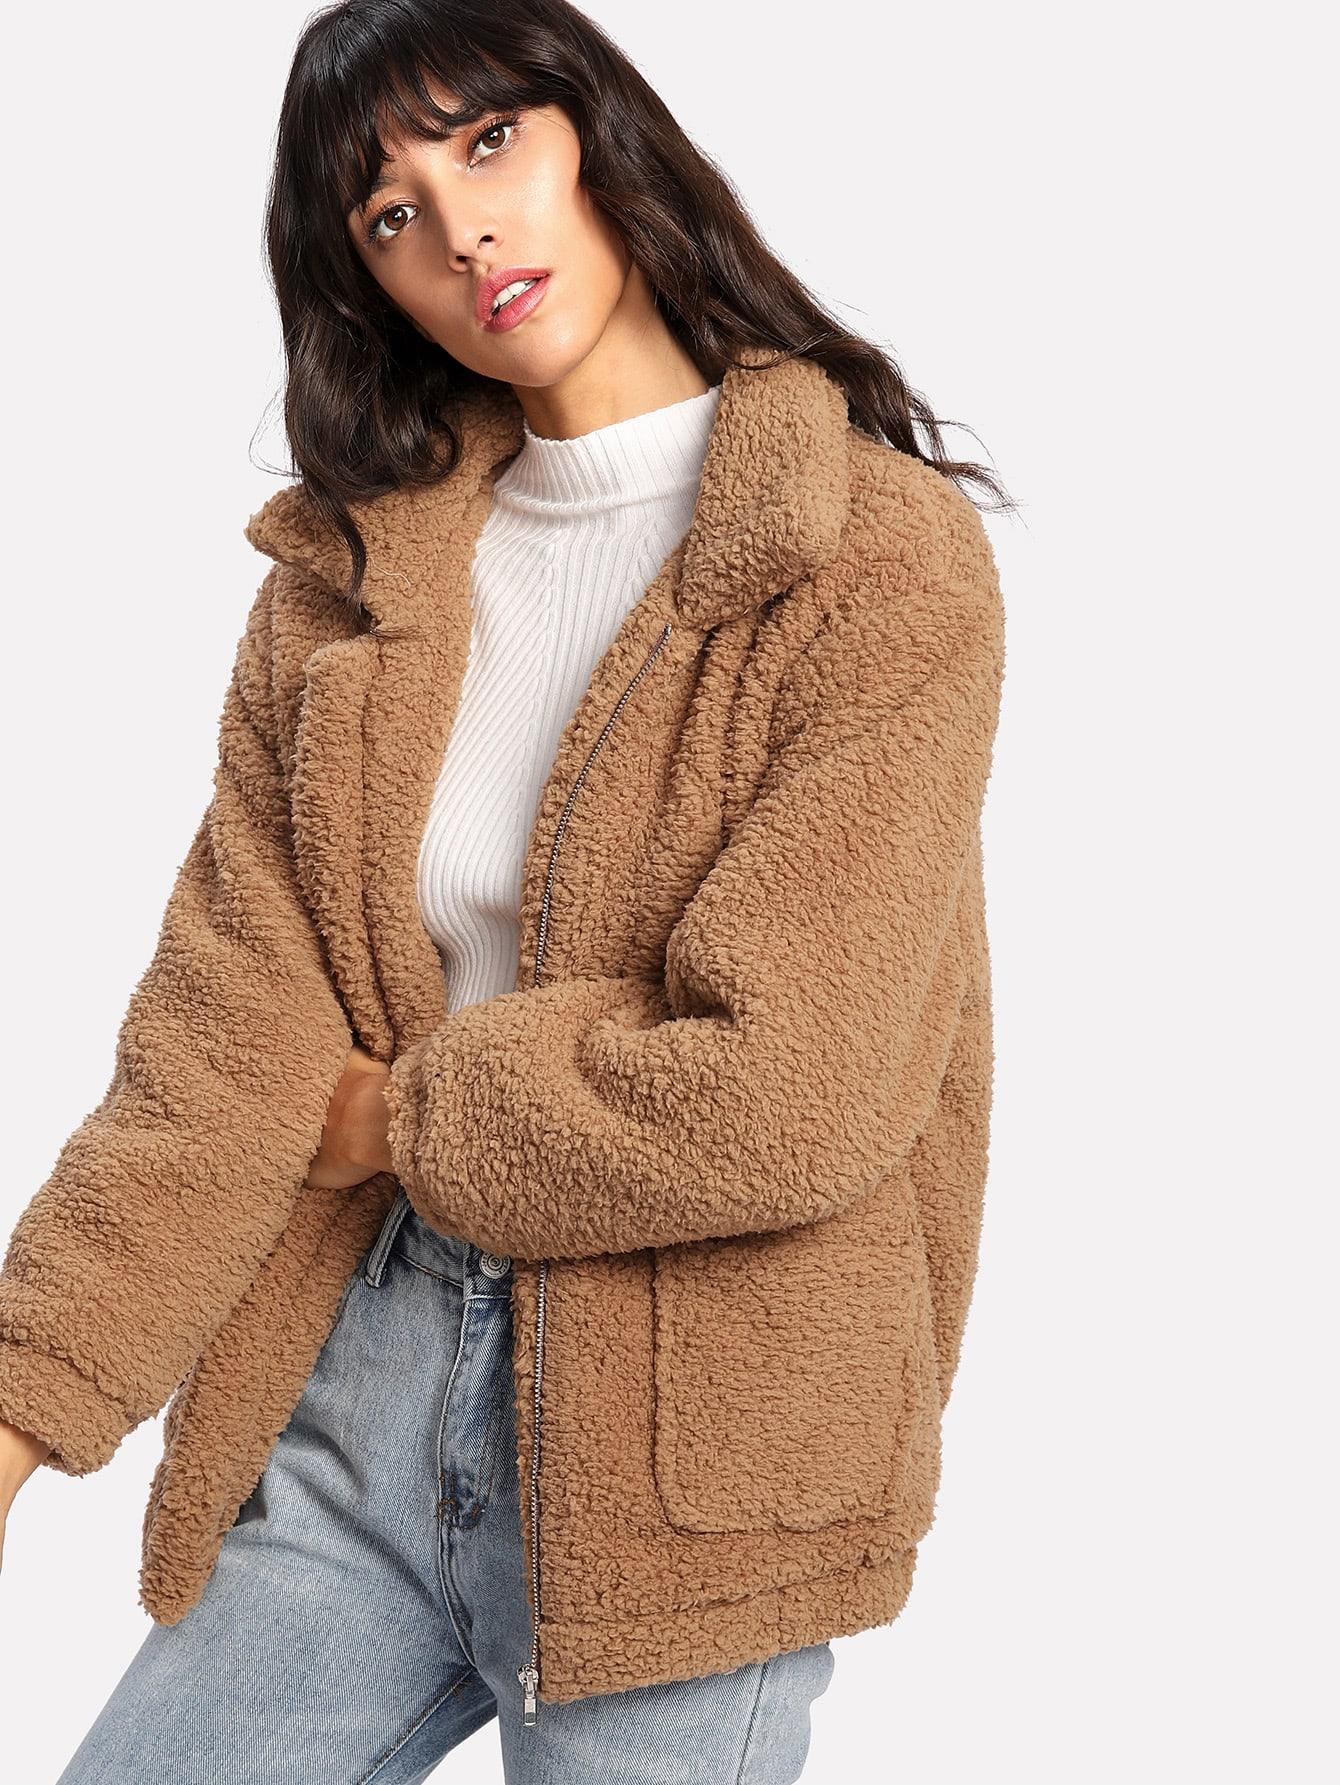 Dual Pocket Faux Fur Jacket EmmaCloth-Women Fast Fashion ...